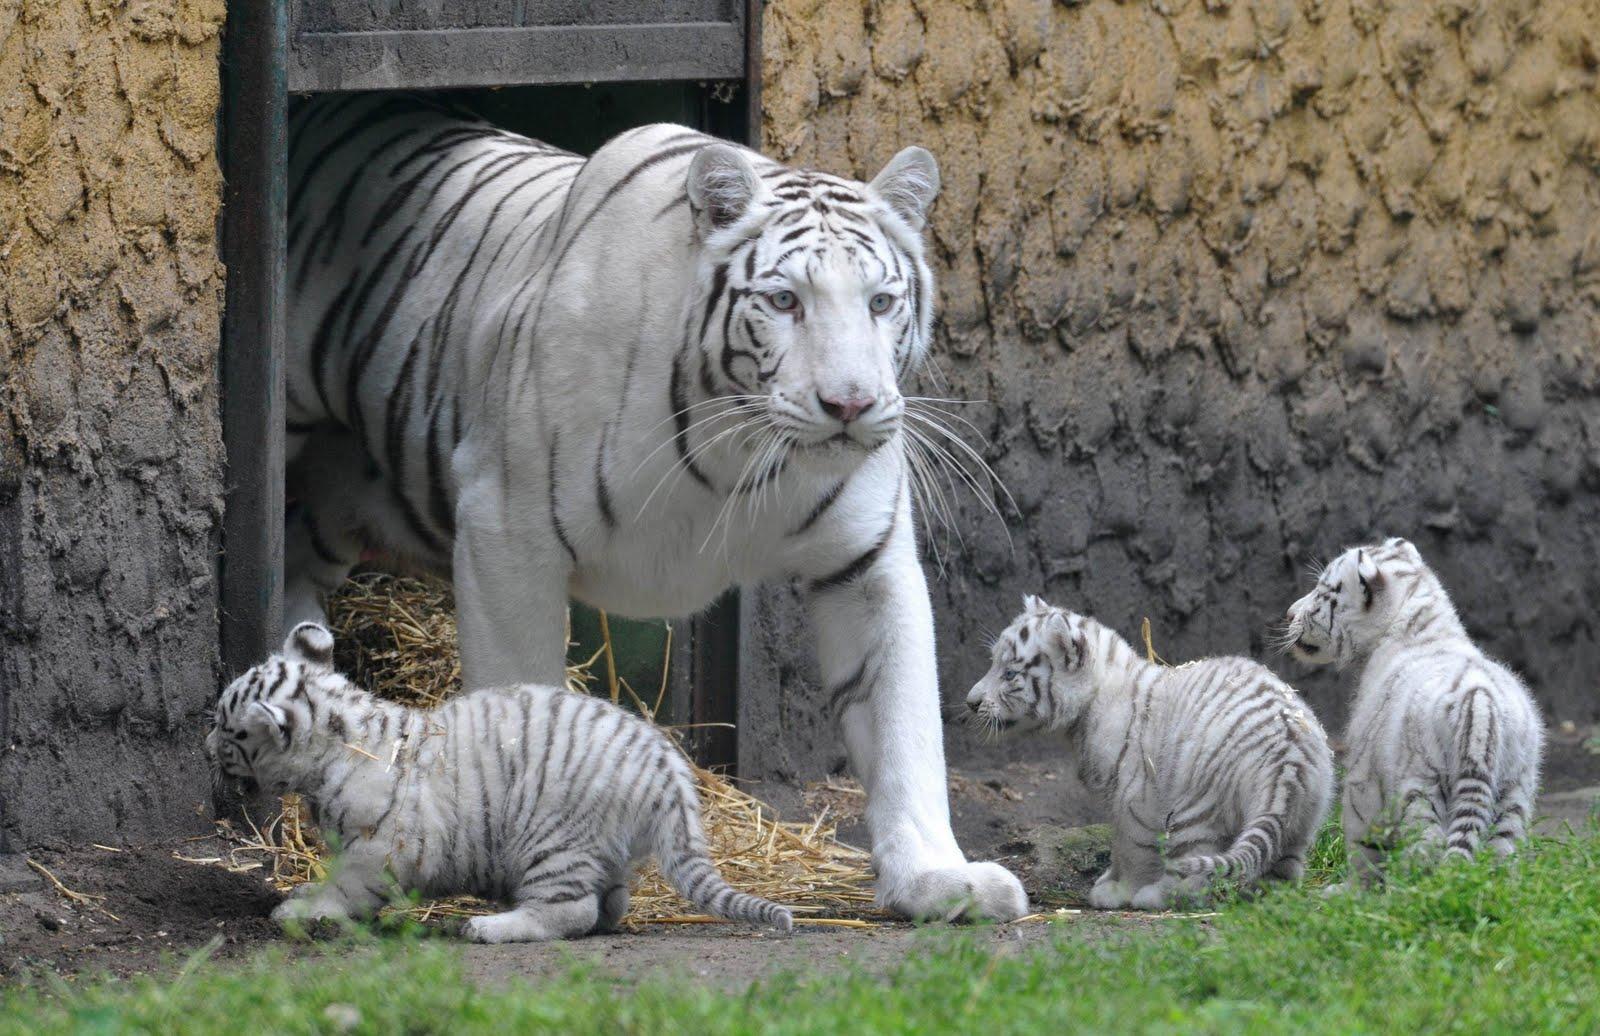 Tigre-Branco | Características dos Tigres-Brancos